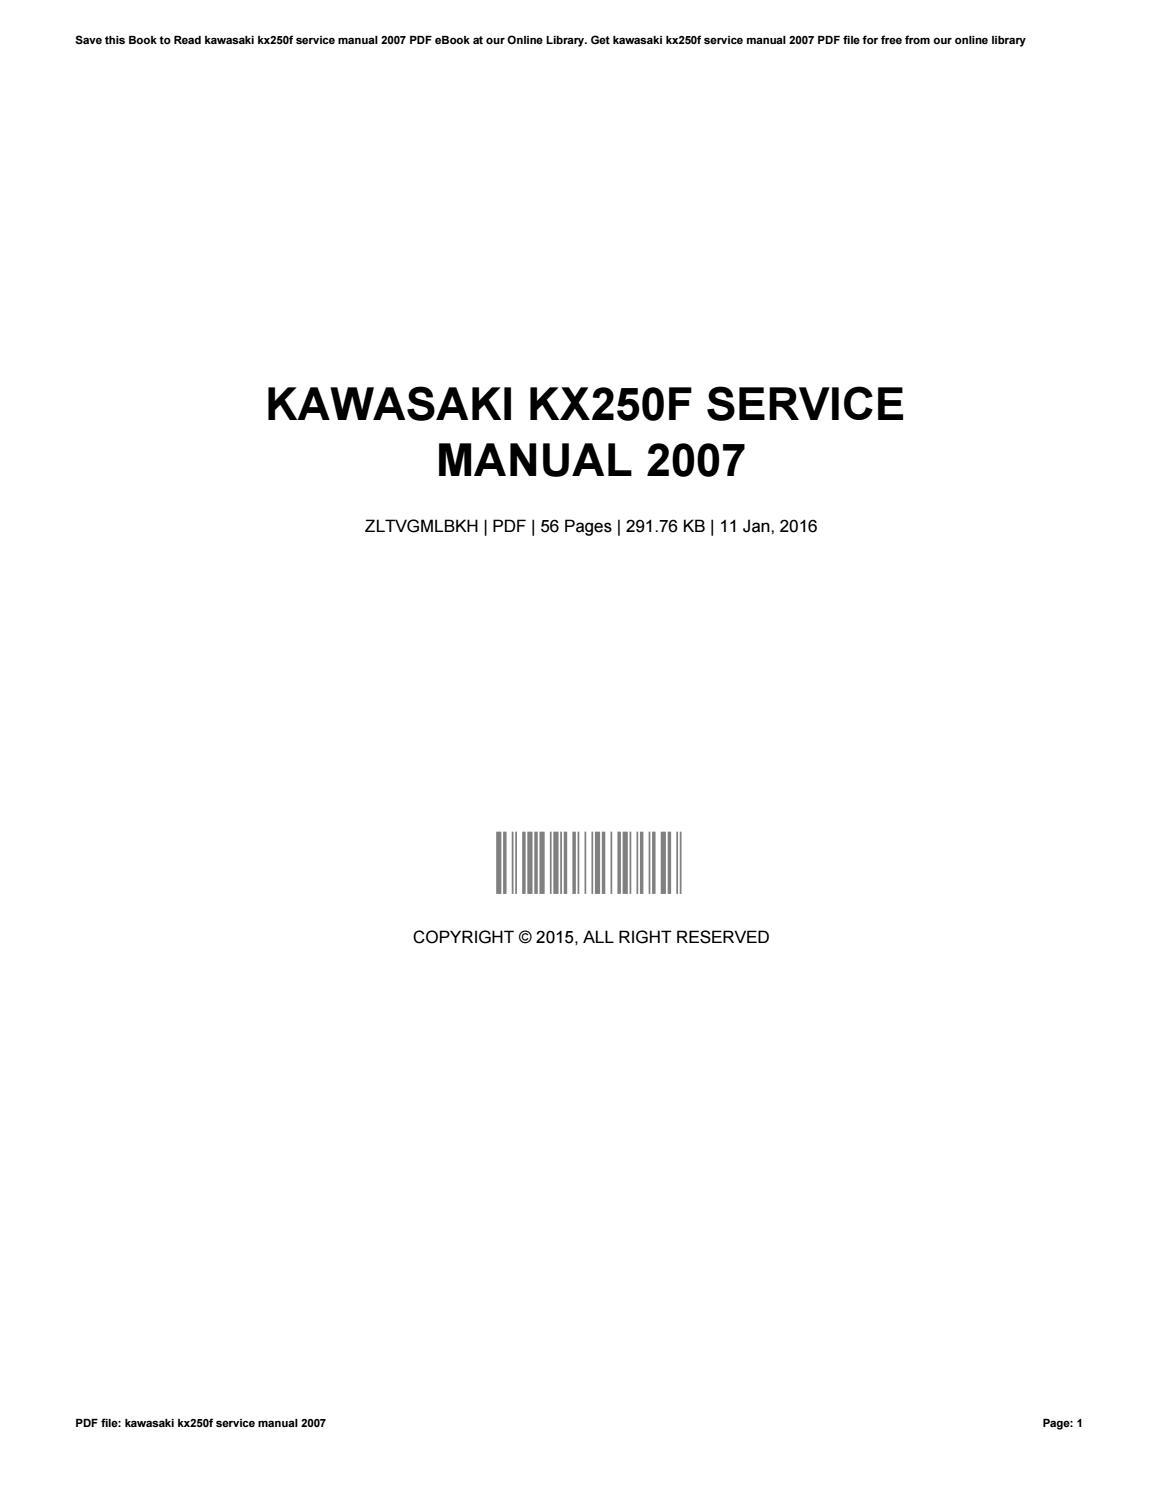 2015 kx250f workshop manual ebook array kawasaki kx250f service manual 2007 by harriettwilliams2229 issuu rh issuu fandeluxe Image collections